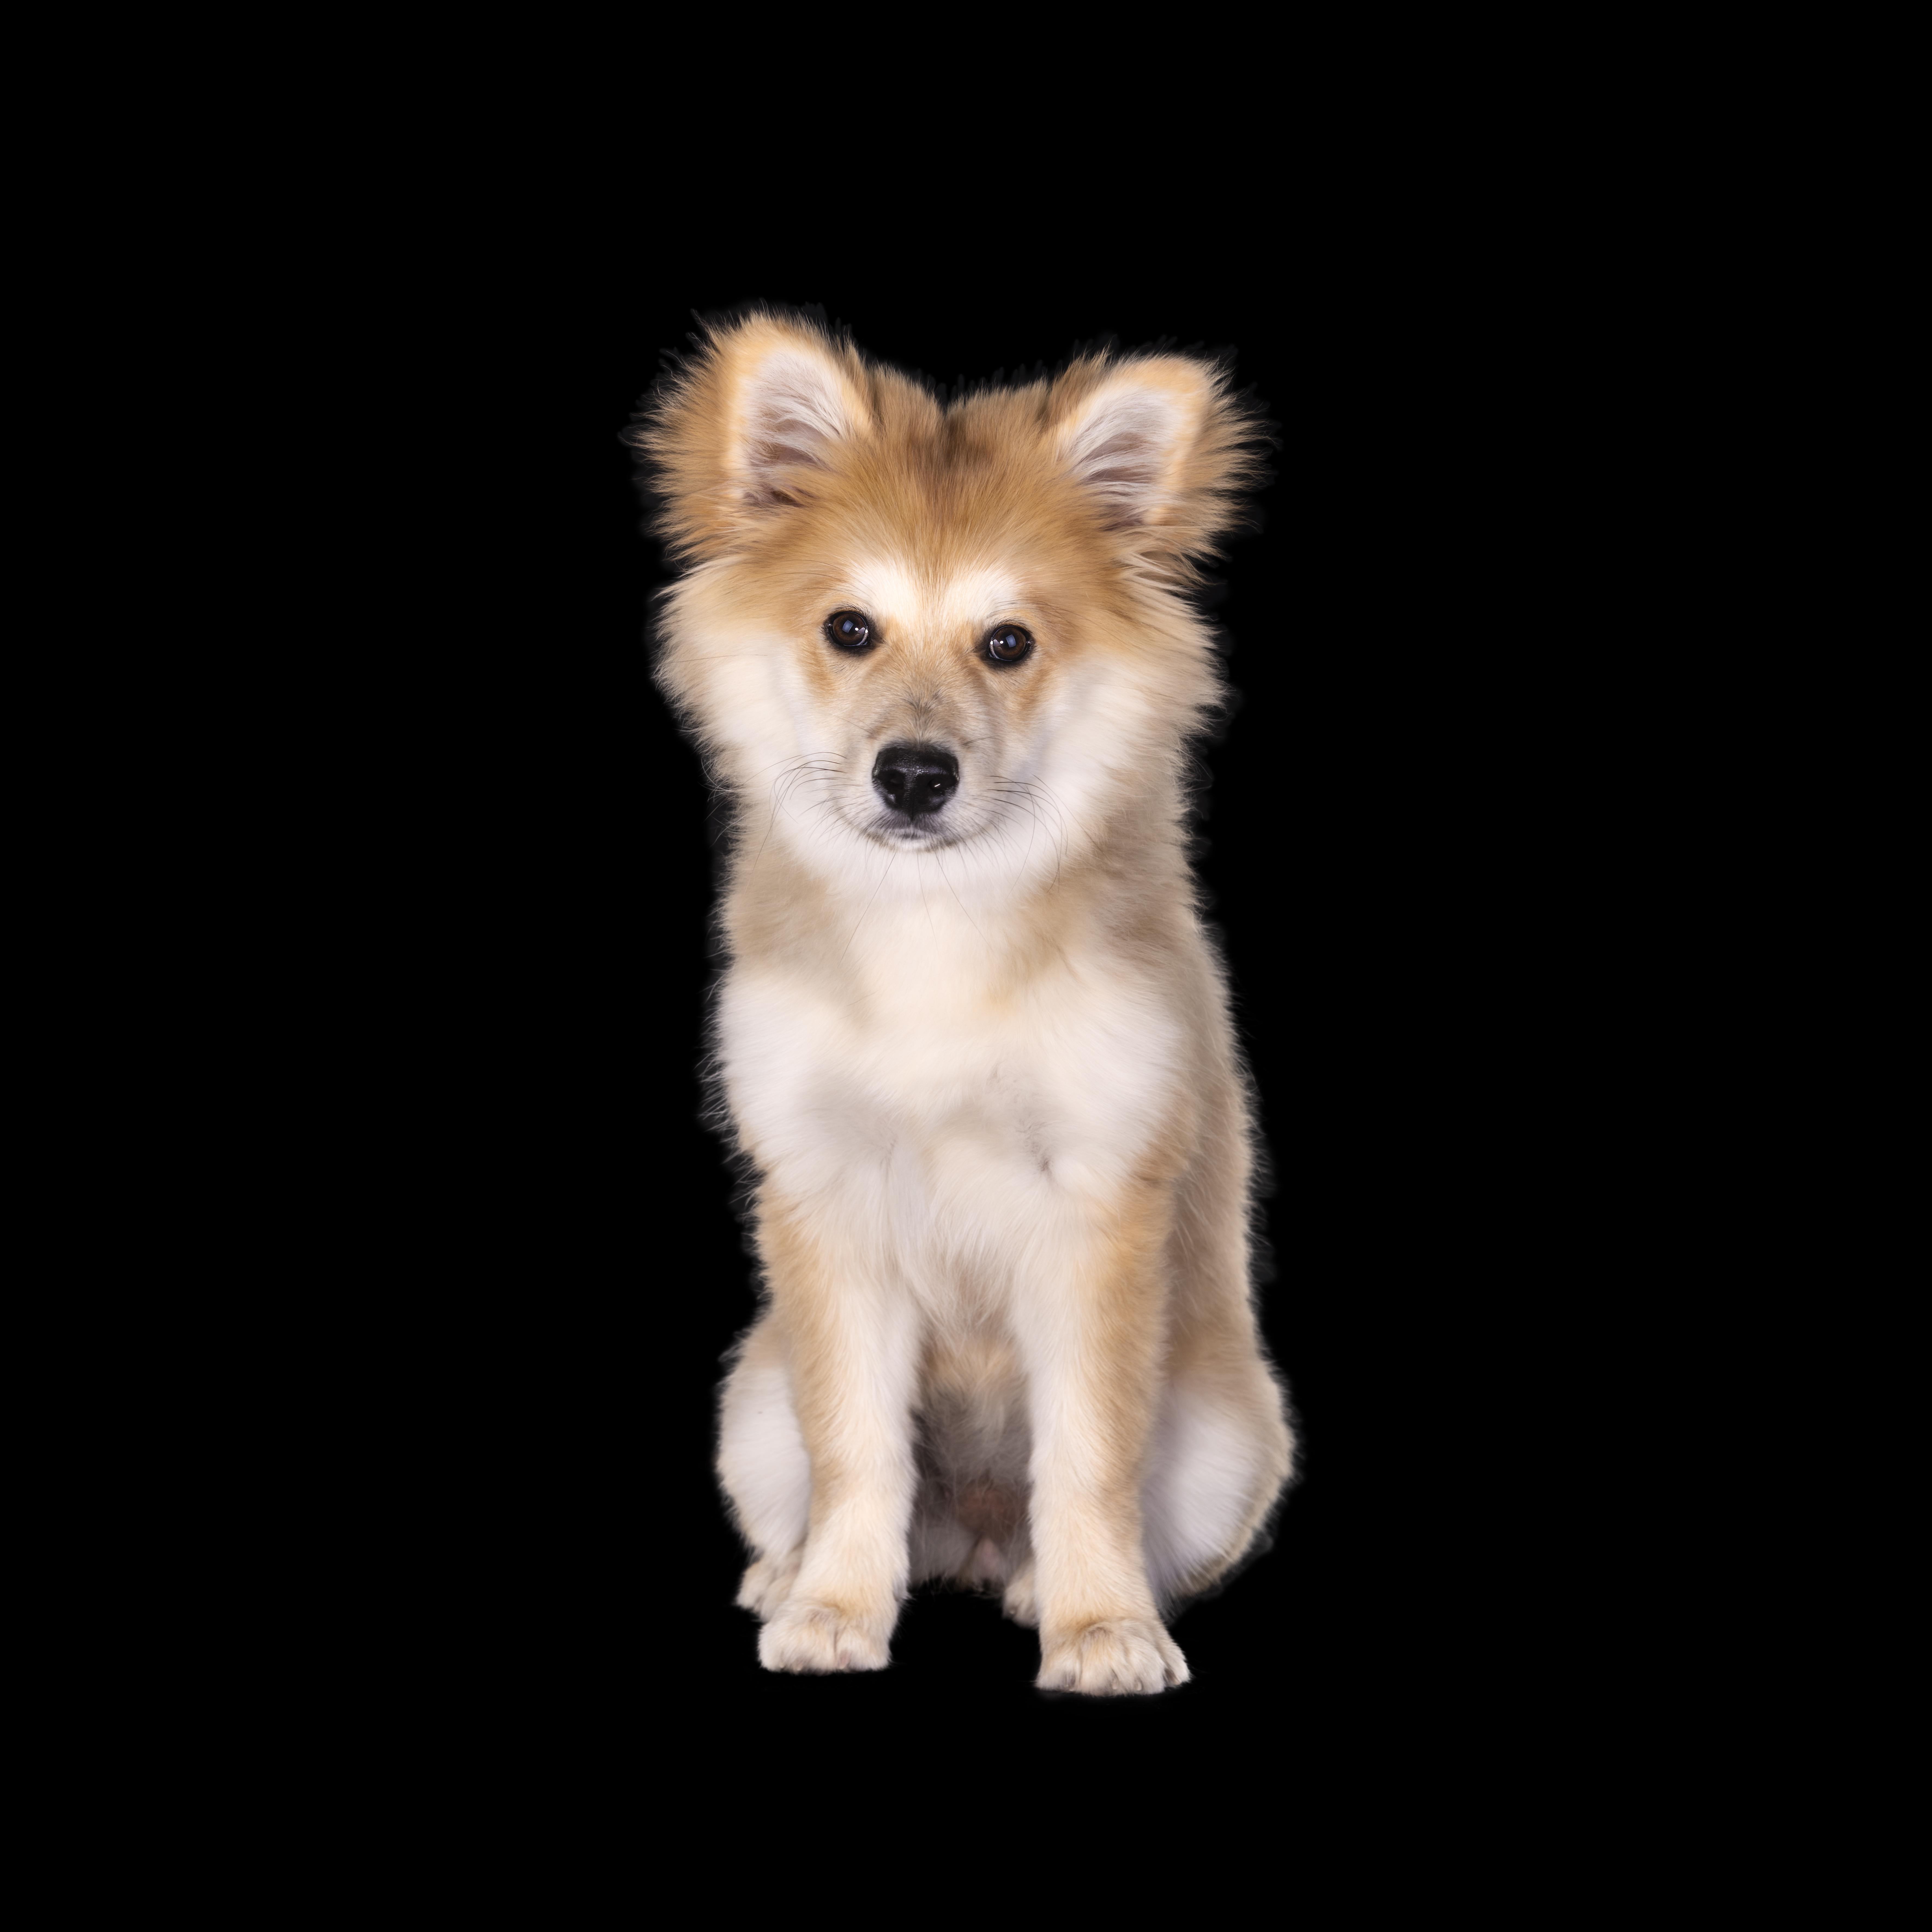 Koko - Portrait of a puppy